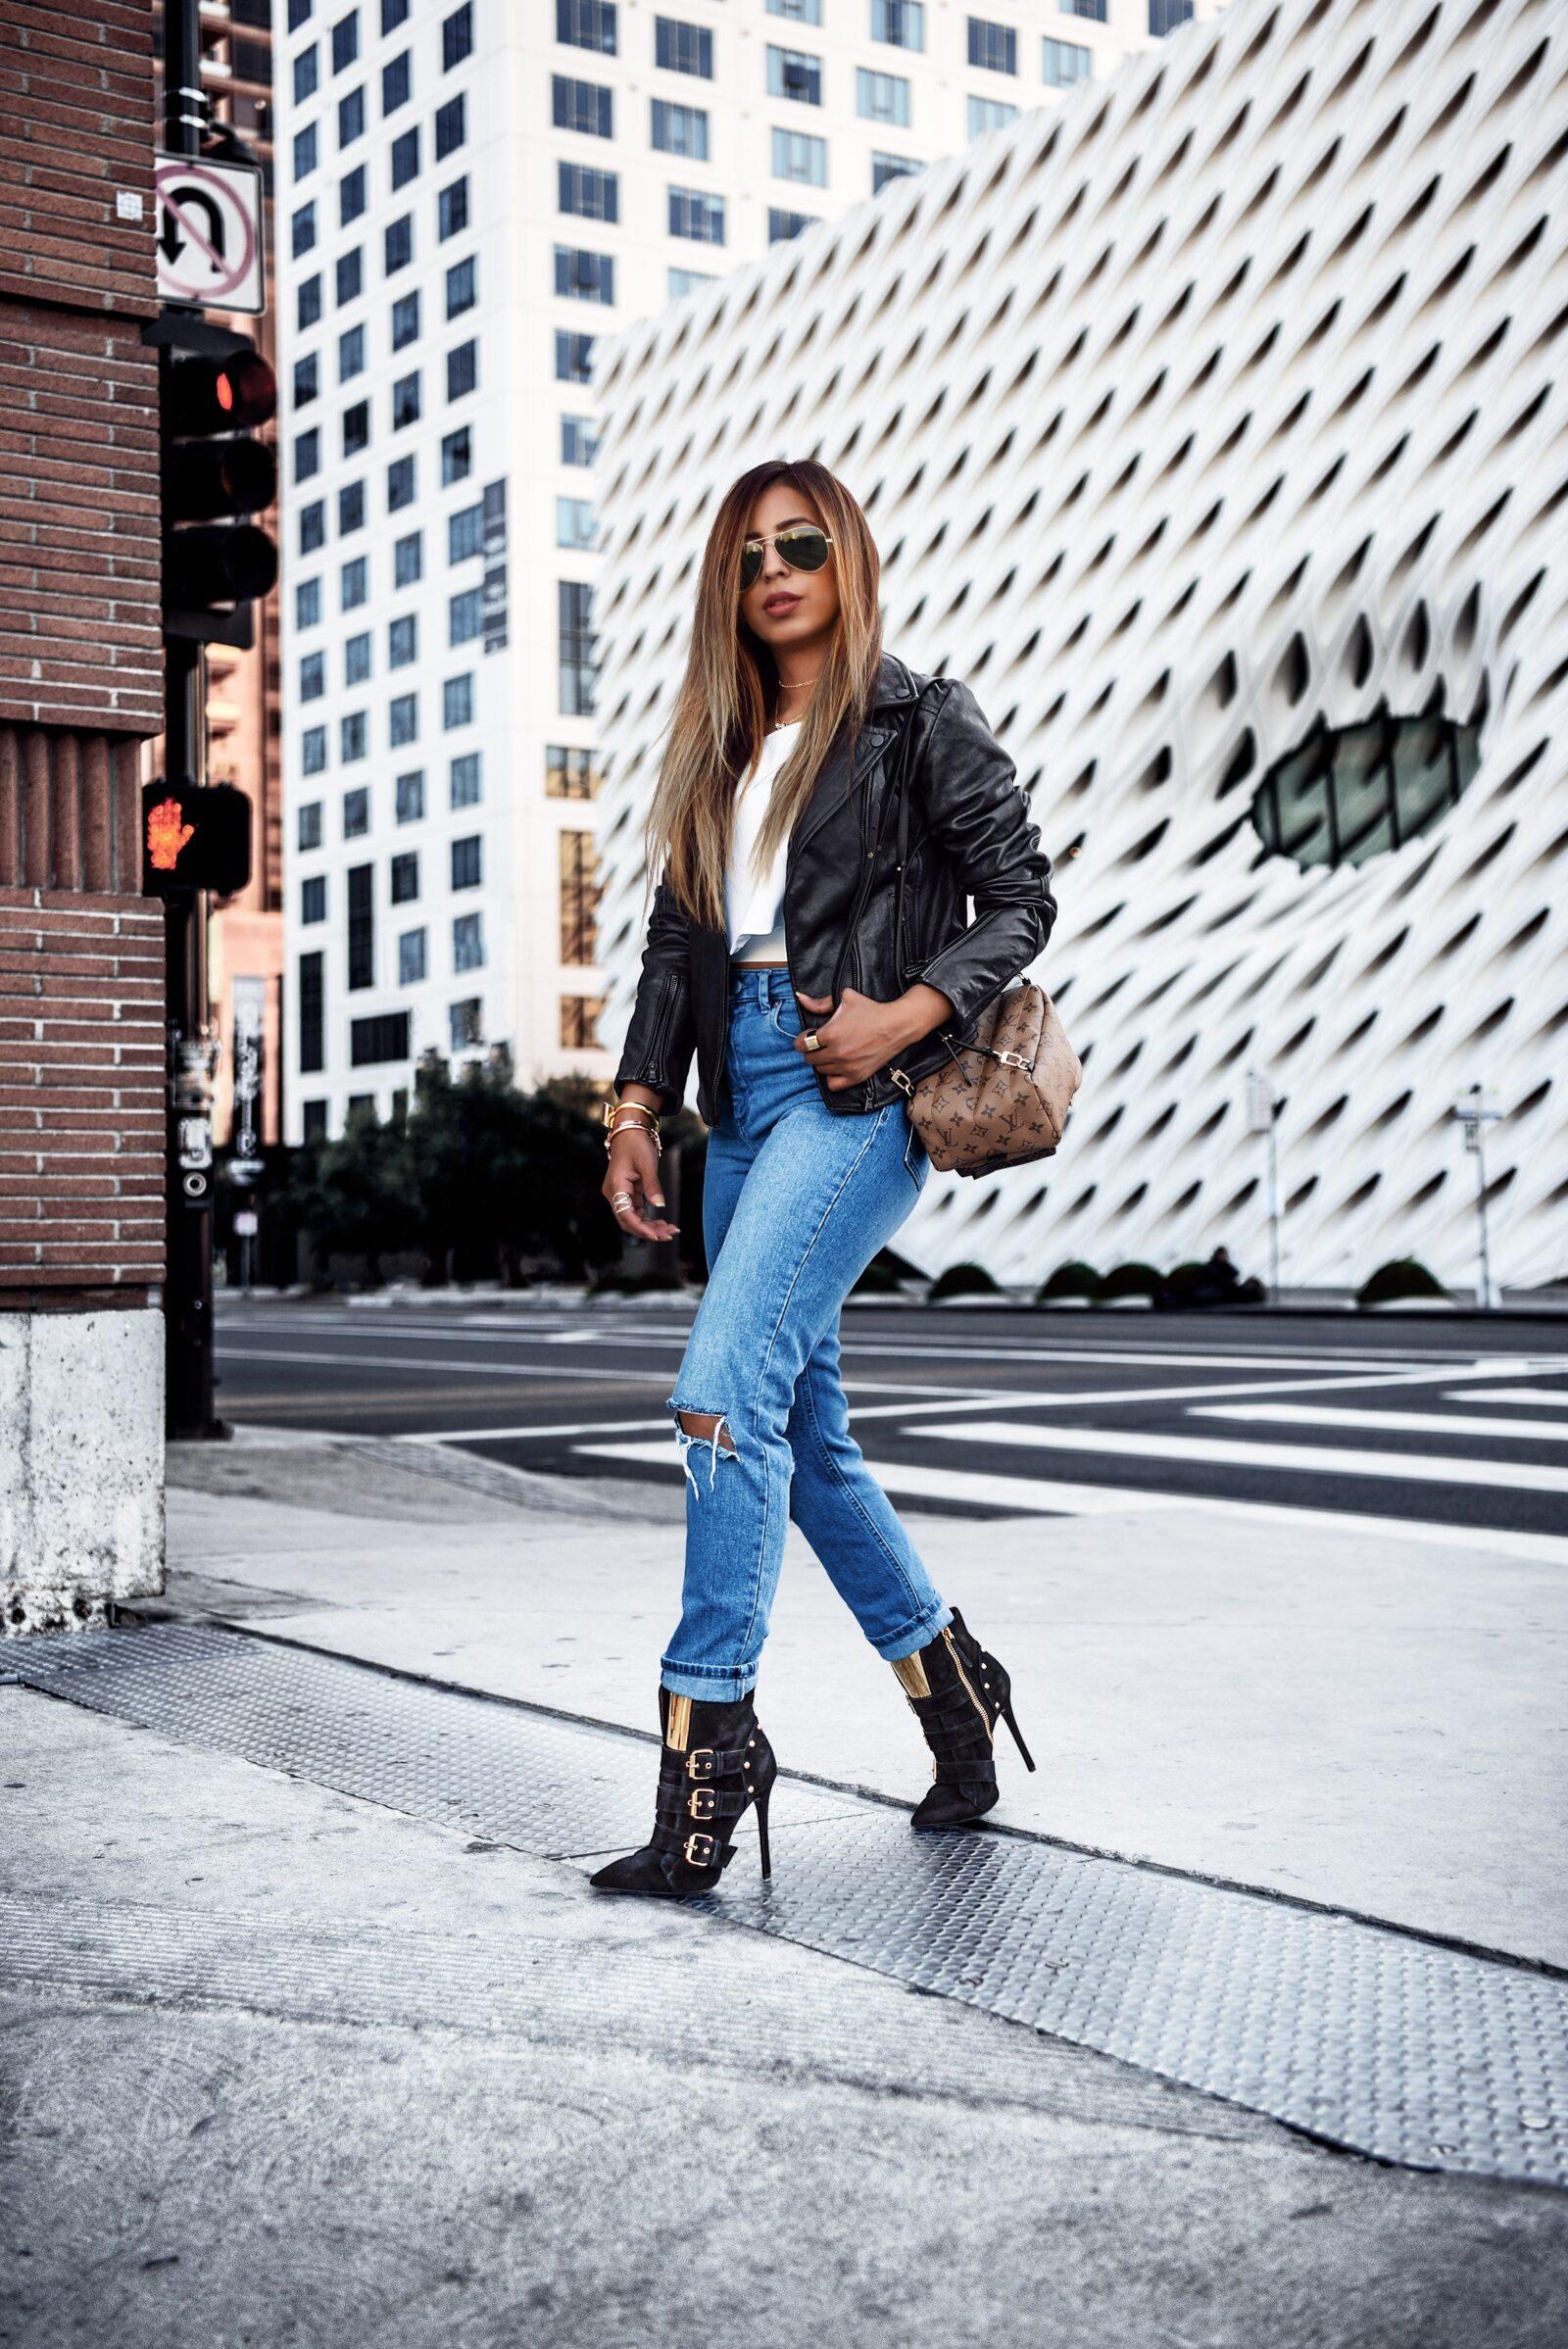 1DSC_5958 black jacket gz shoes_R by me